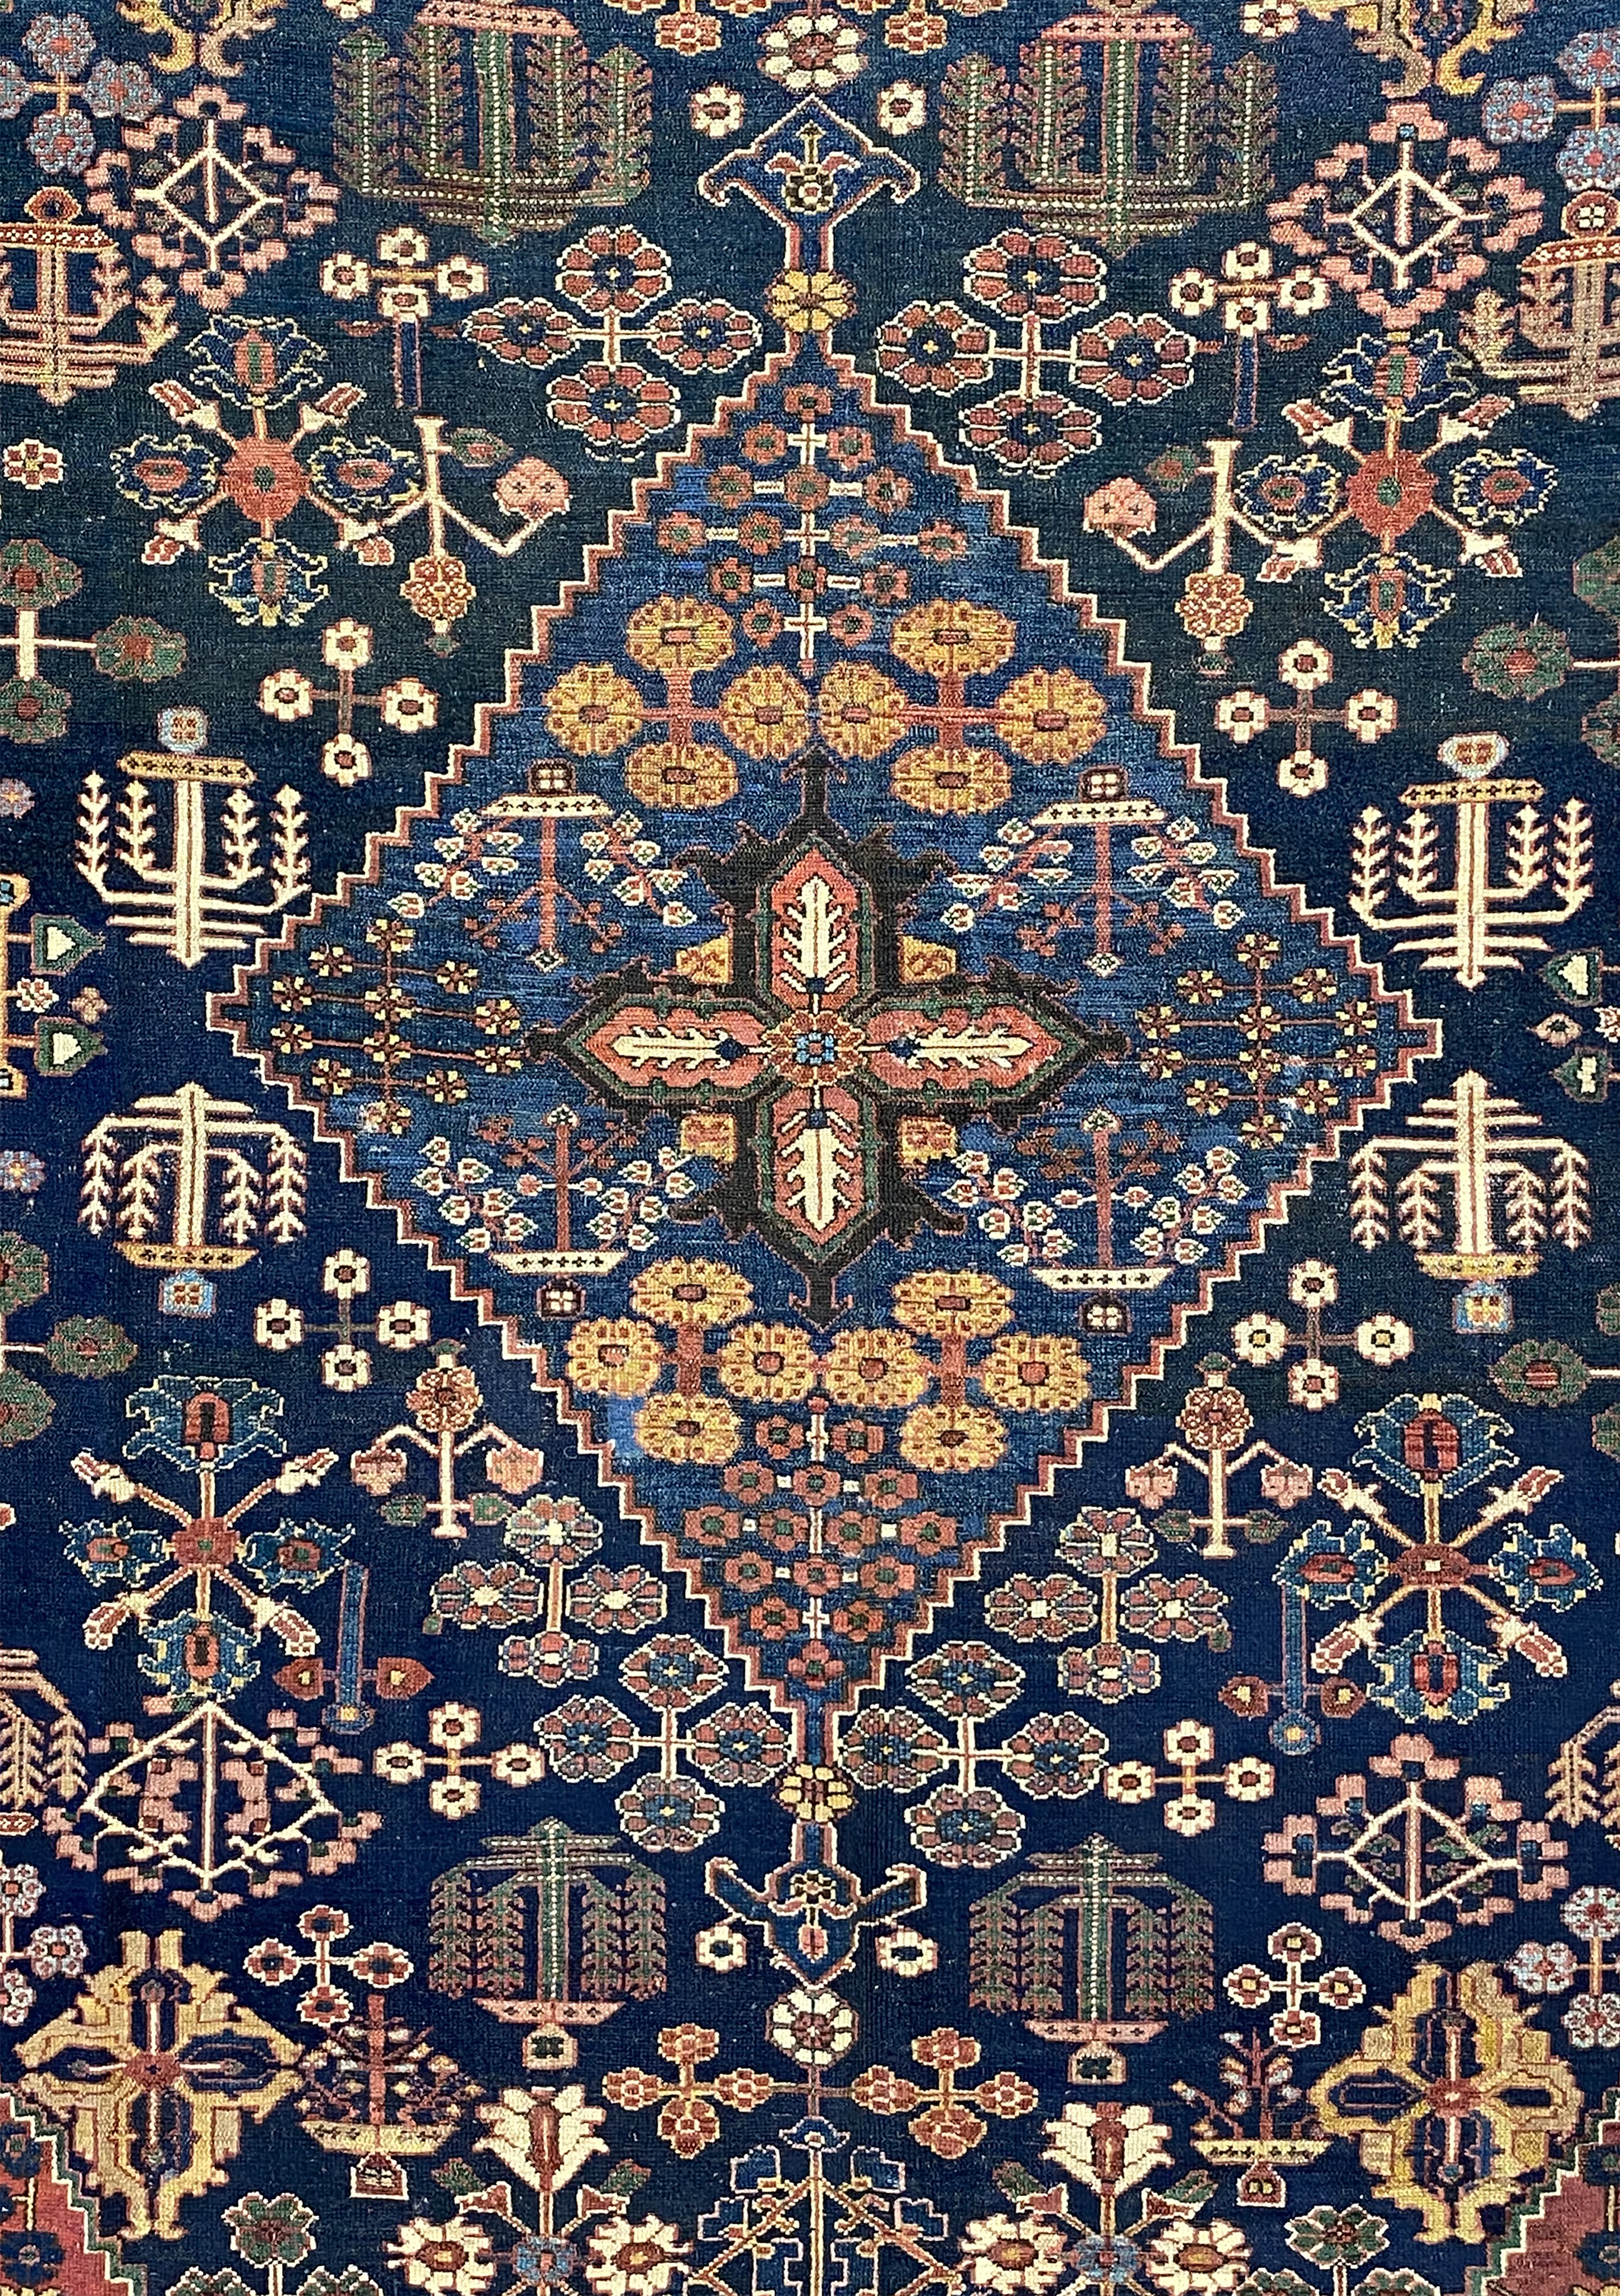 "Antique Persian Ziegler Bakhtiari 10' 2"" x 14' 8"" - Shabahang Royal Carpet"